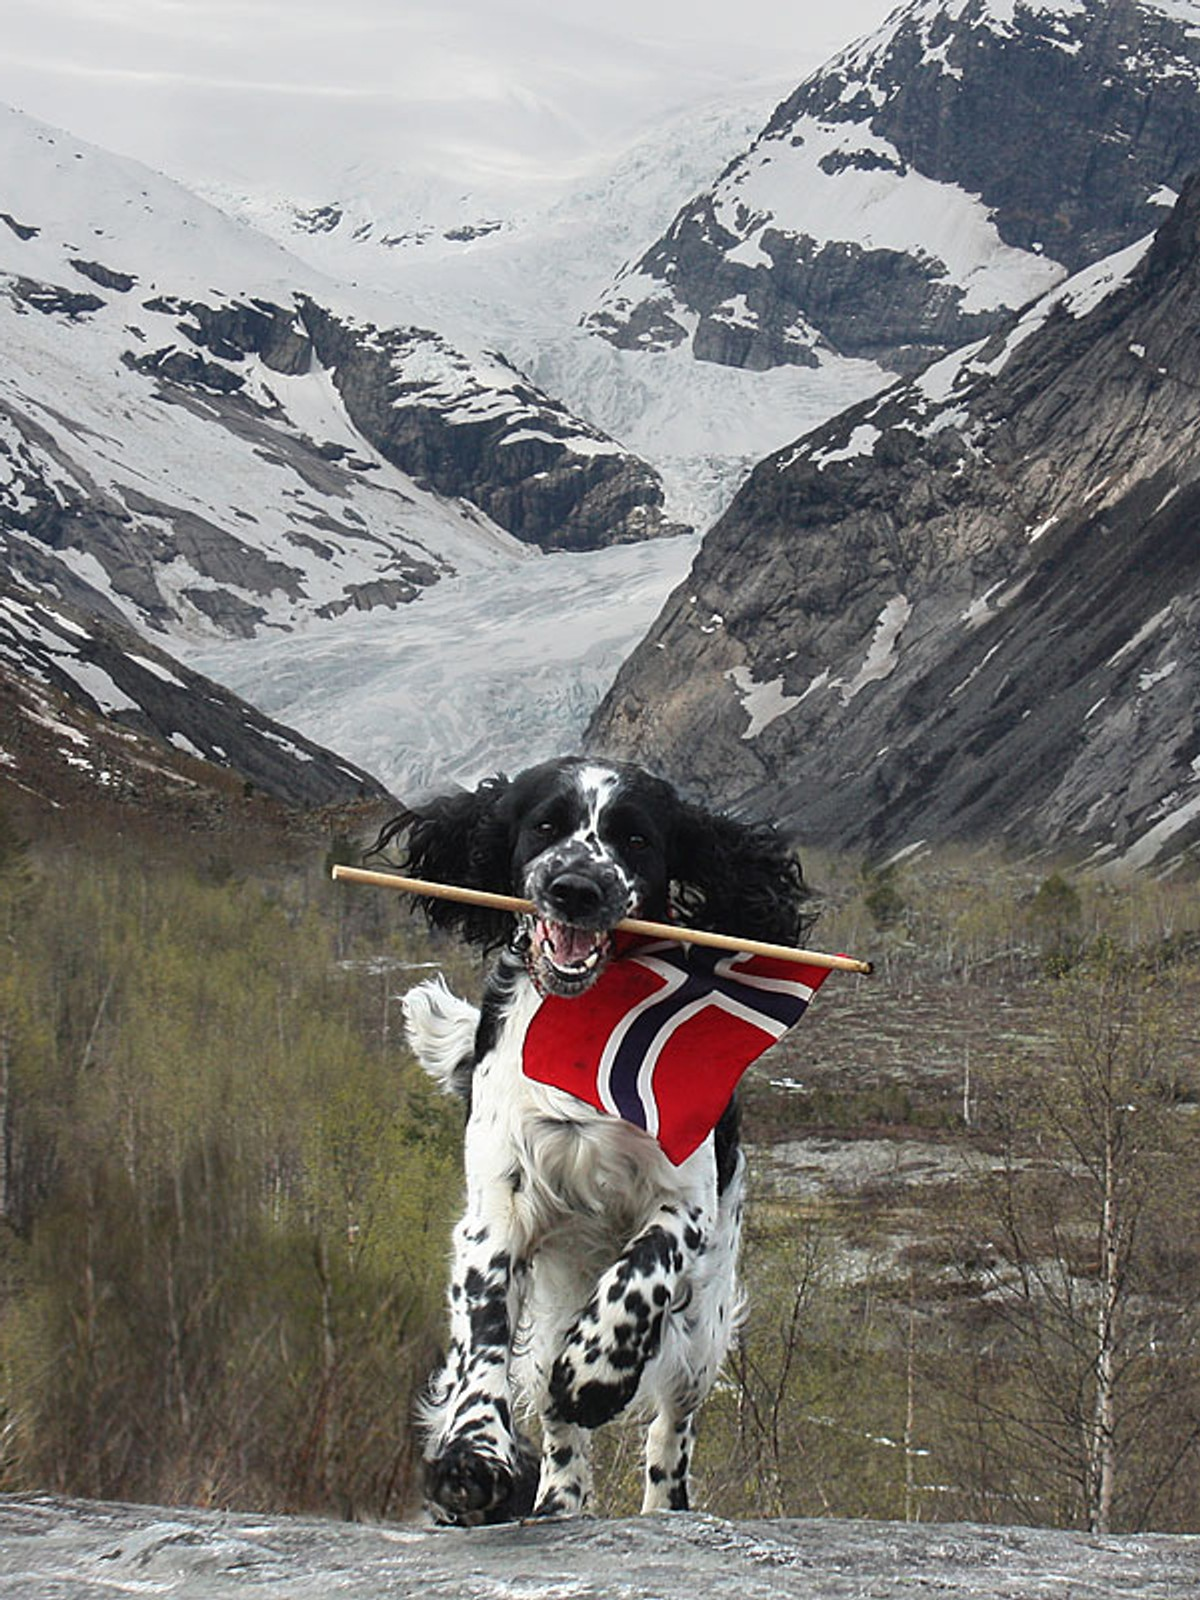 aksel og tone sogn og fjordane